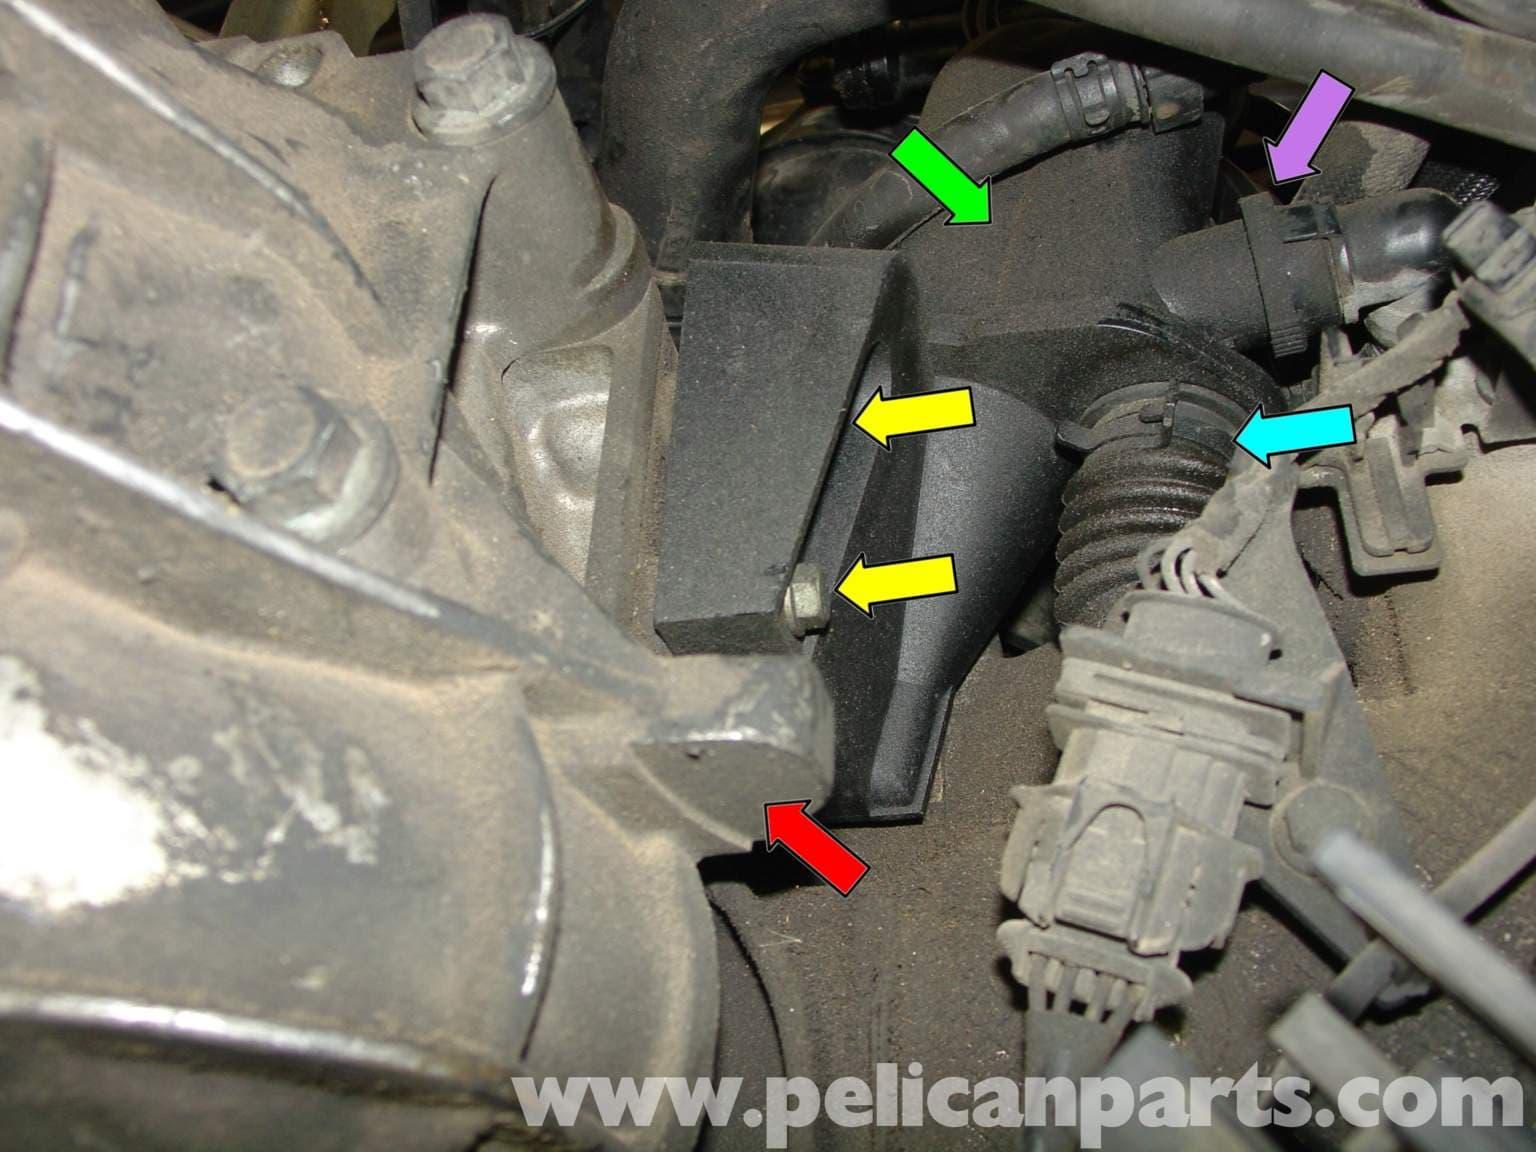 Porsche Boxster Air / Oil Separator Replacement - 986 / 987 (1997-08) - Pelican Parts Technical ...